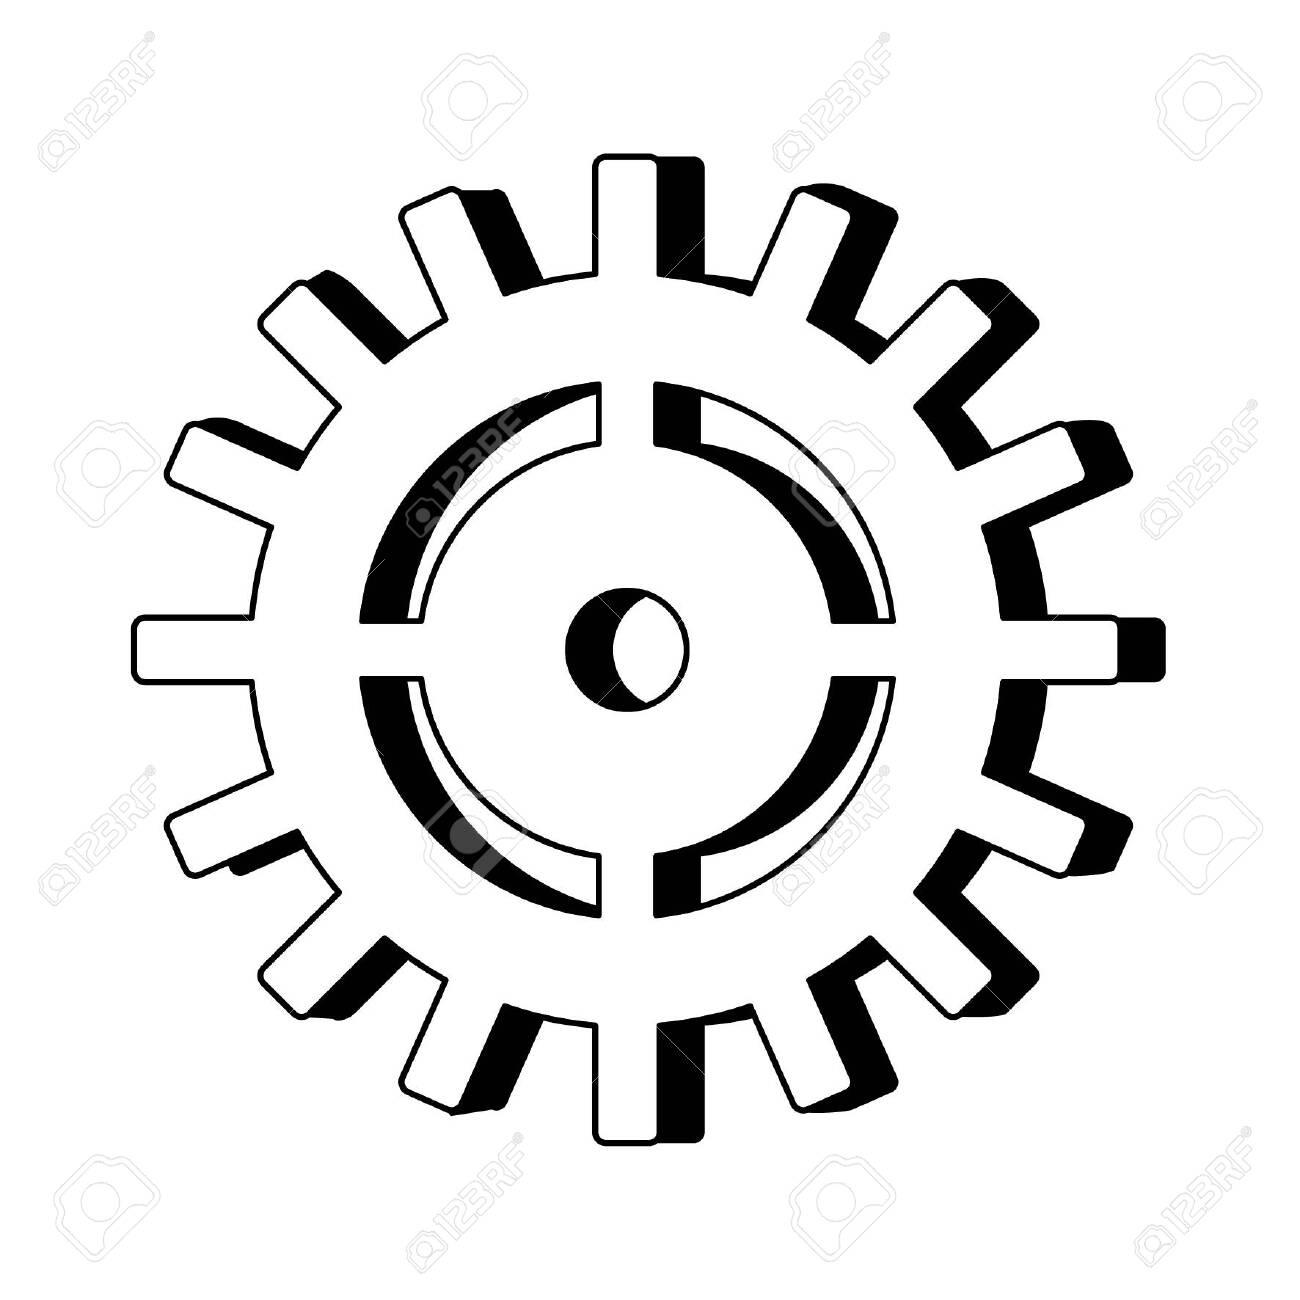 Gear machinery symbol isolated cartoon vector illustration graphic design - 125357105